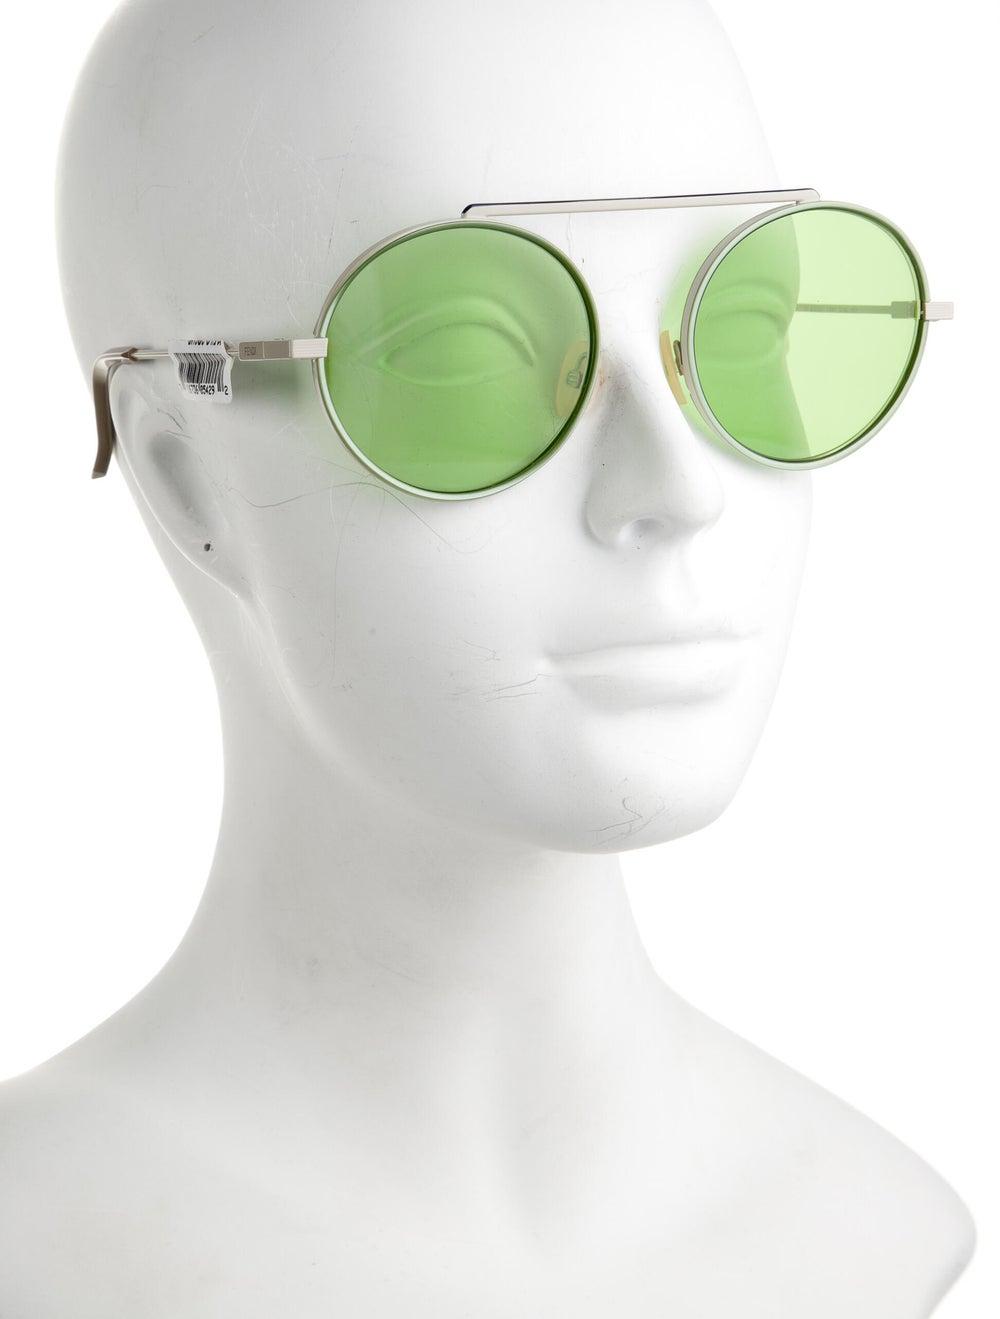 Fendi Round Tinted Sunglasses - image 4